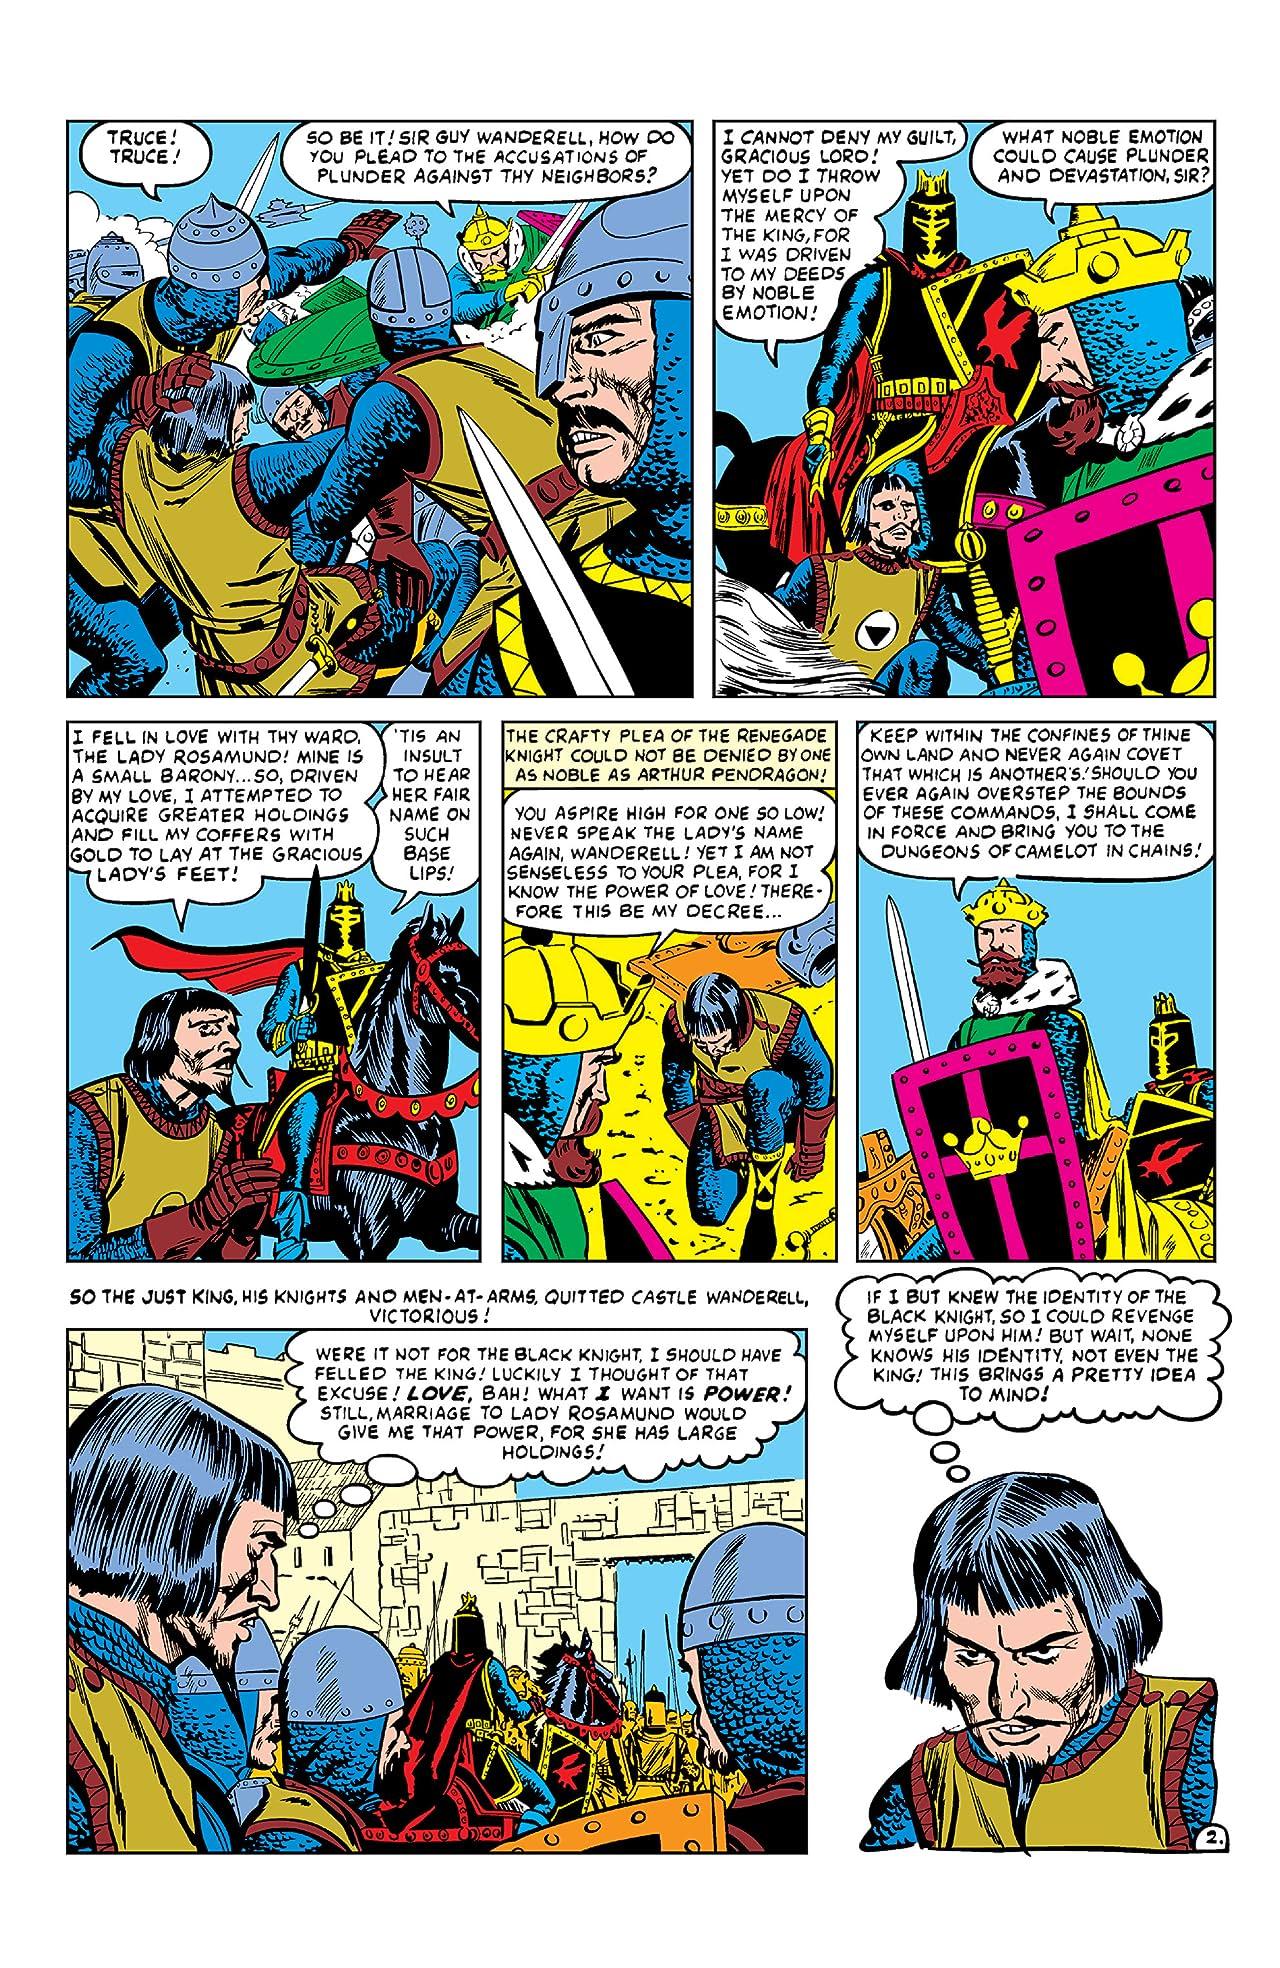 The Black Knight (1955-1956) #4